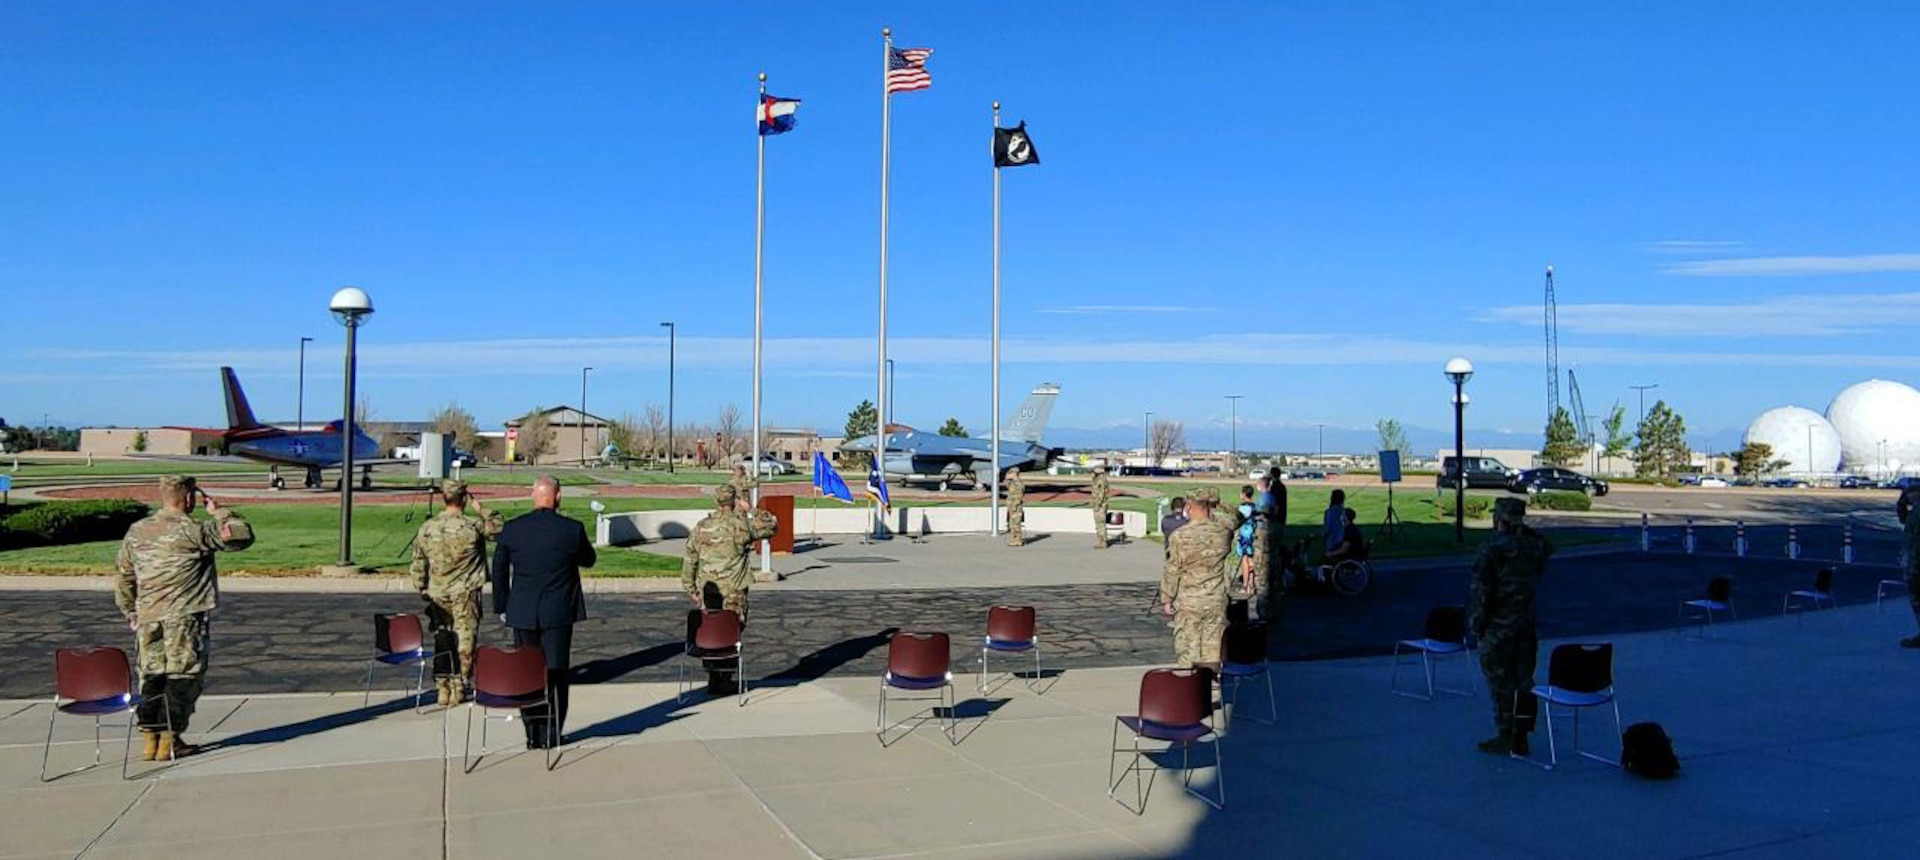 U.S. Air Force Gen. Joseph L. Lengyel, chief, National Guard Bureau, promotes U.S. Air Force Brig. Gen. Gregory T. White, director of space operations, National Guard Bureau, to major general May 20, 2020, at Buckley Air Force Base, Aurora, Colorado.